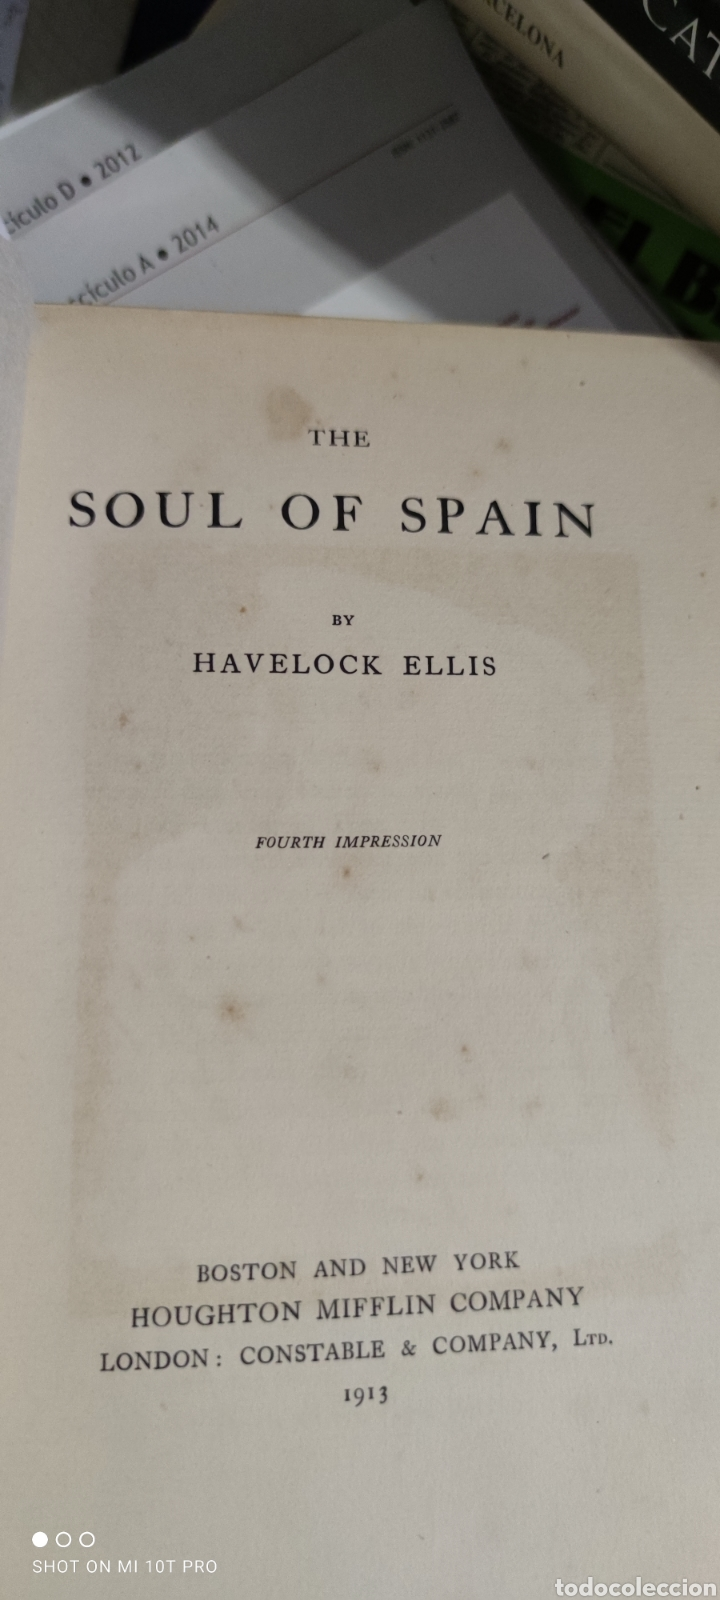 Libros antiguos: The soul of spain havelock ellis.1913 - Foto 2 - 275544978